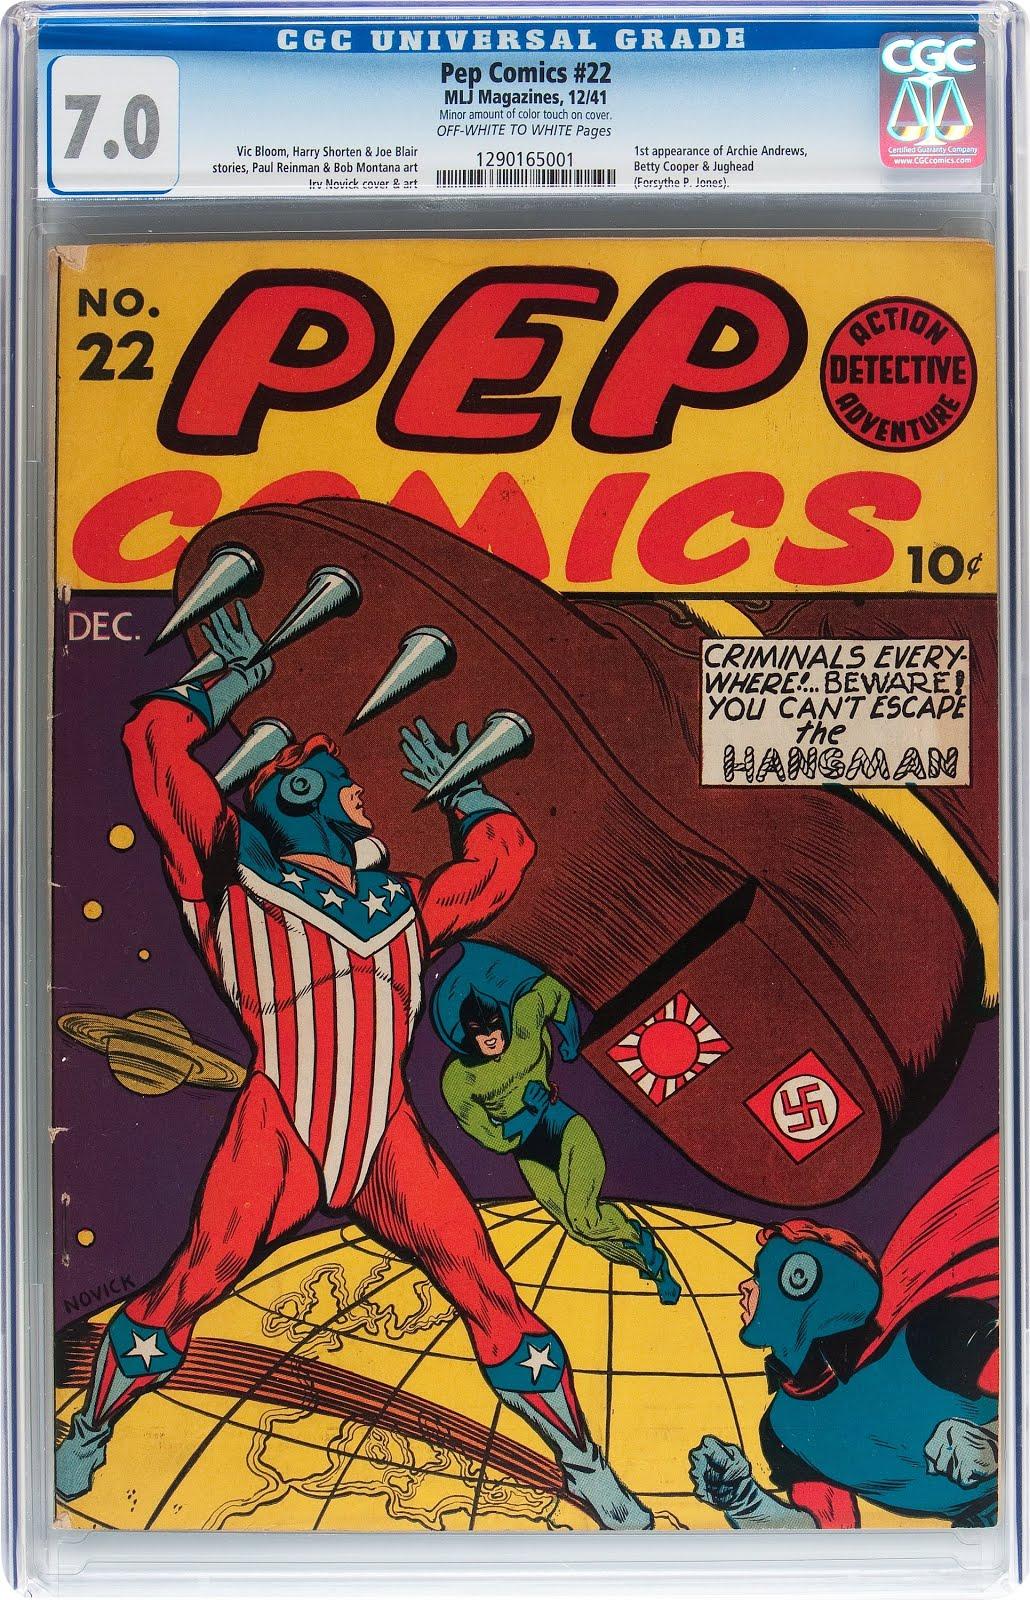 Graded Key Comics: January 2017